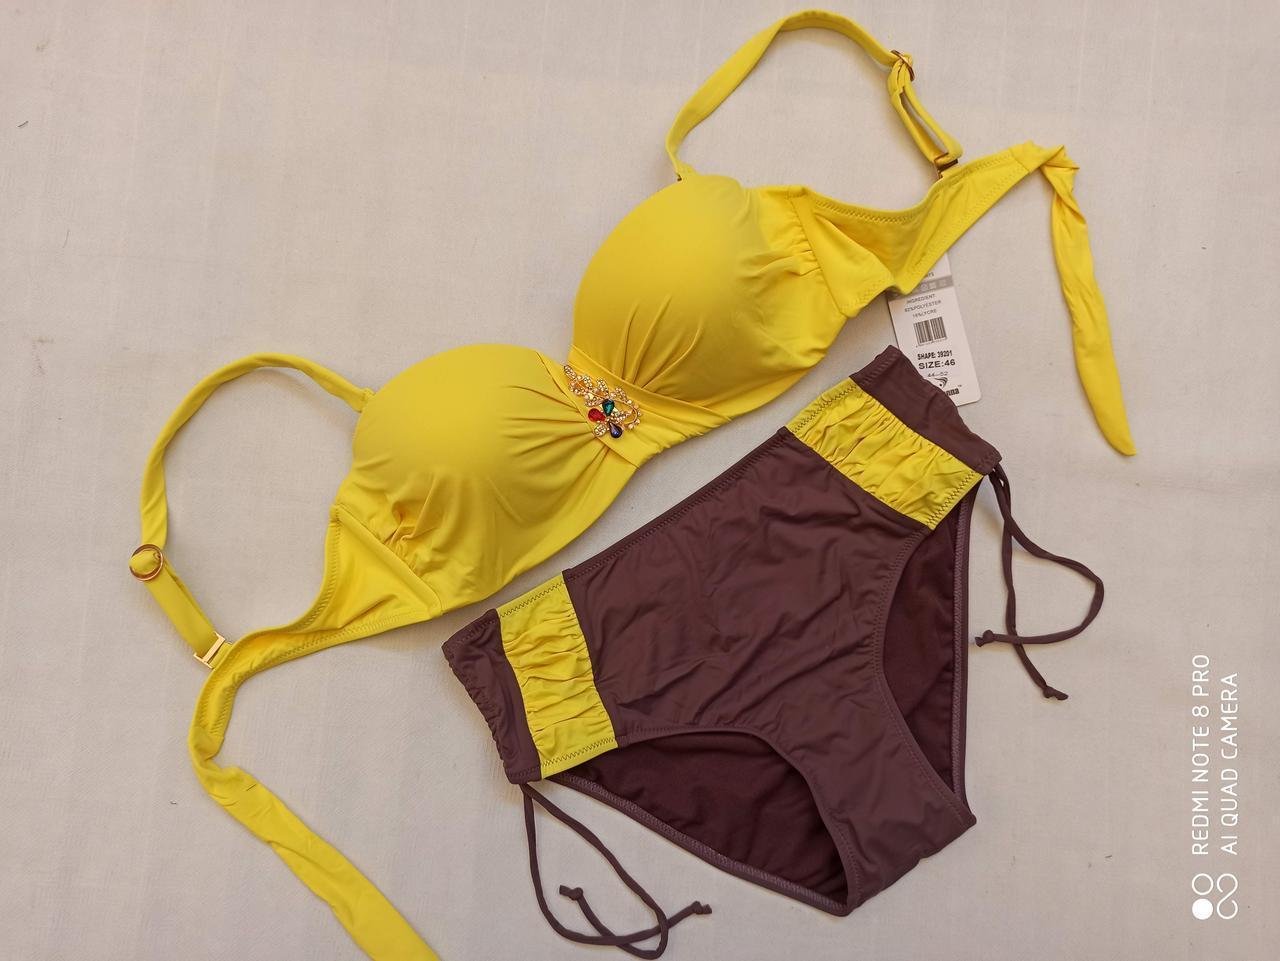 4Купальник SISIANNA 39201 Зита желтый (есть 48 размеры)